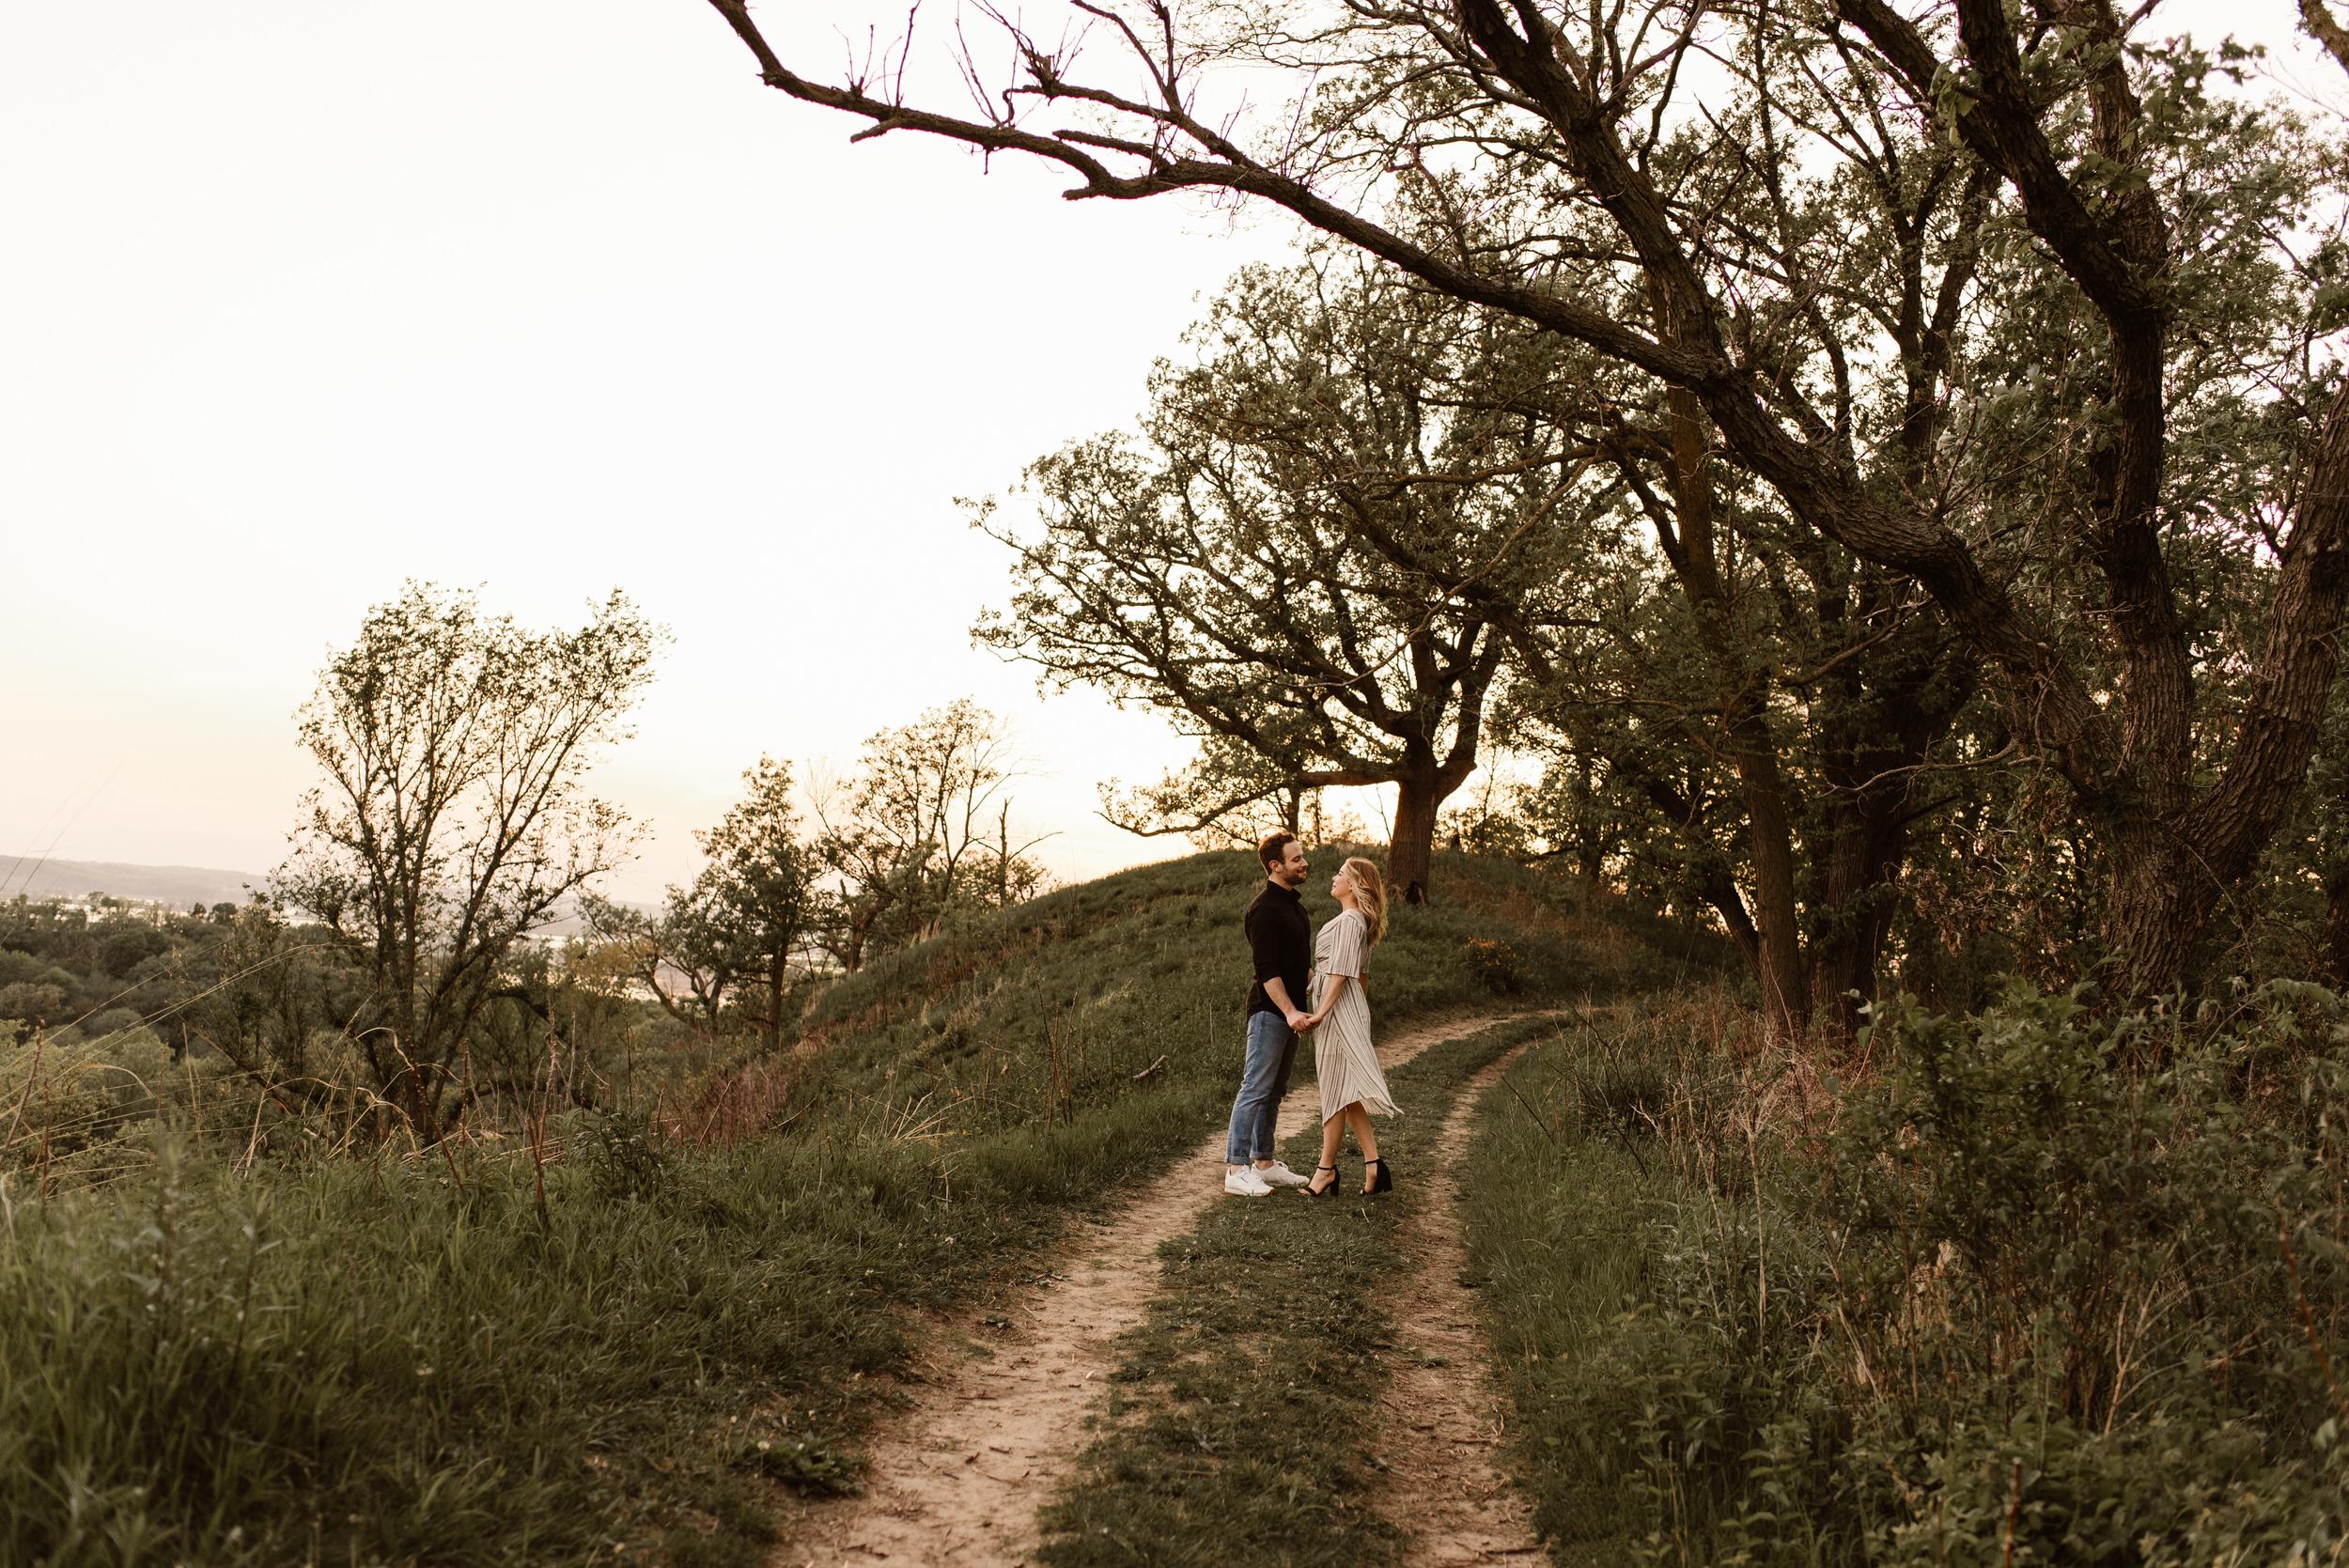 Omaha-Nebraska-Engagement-Session-Kaylie-Sirek-Photography-168.jpg